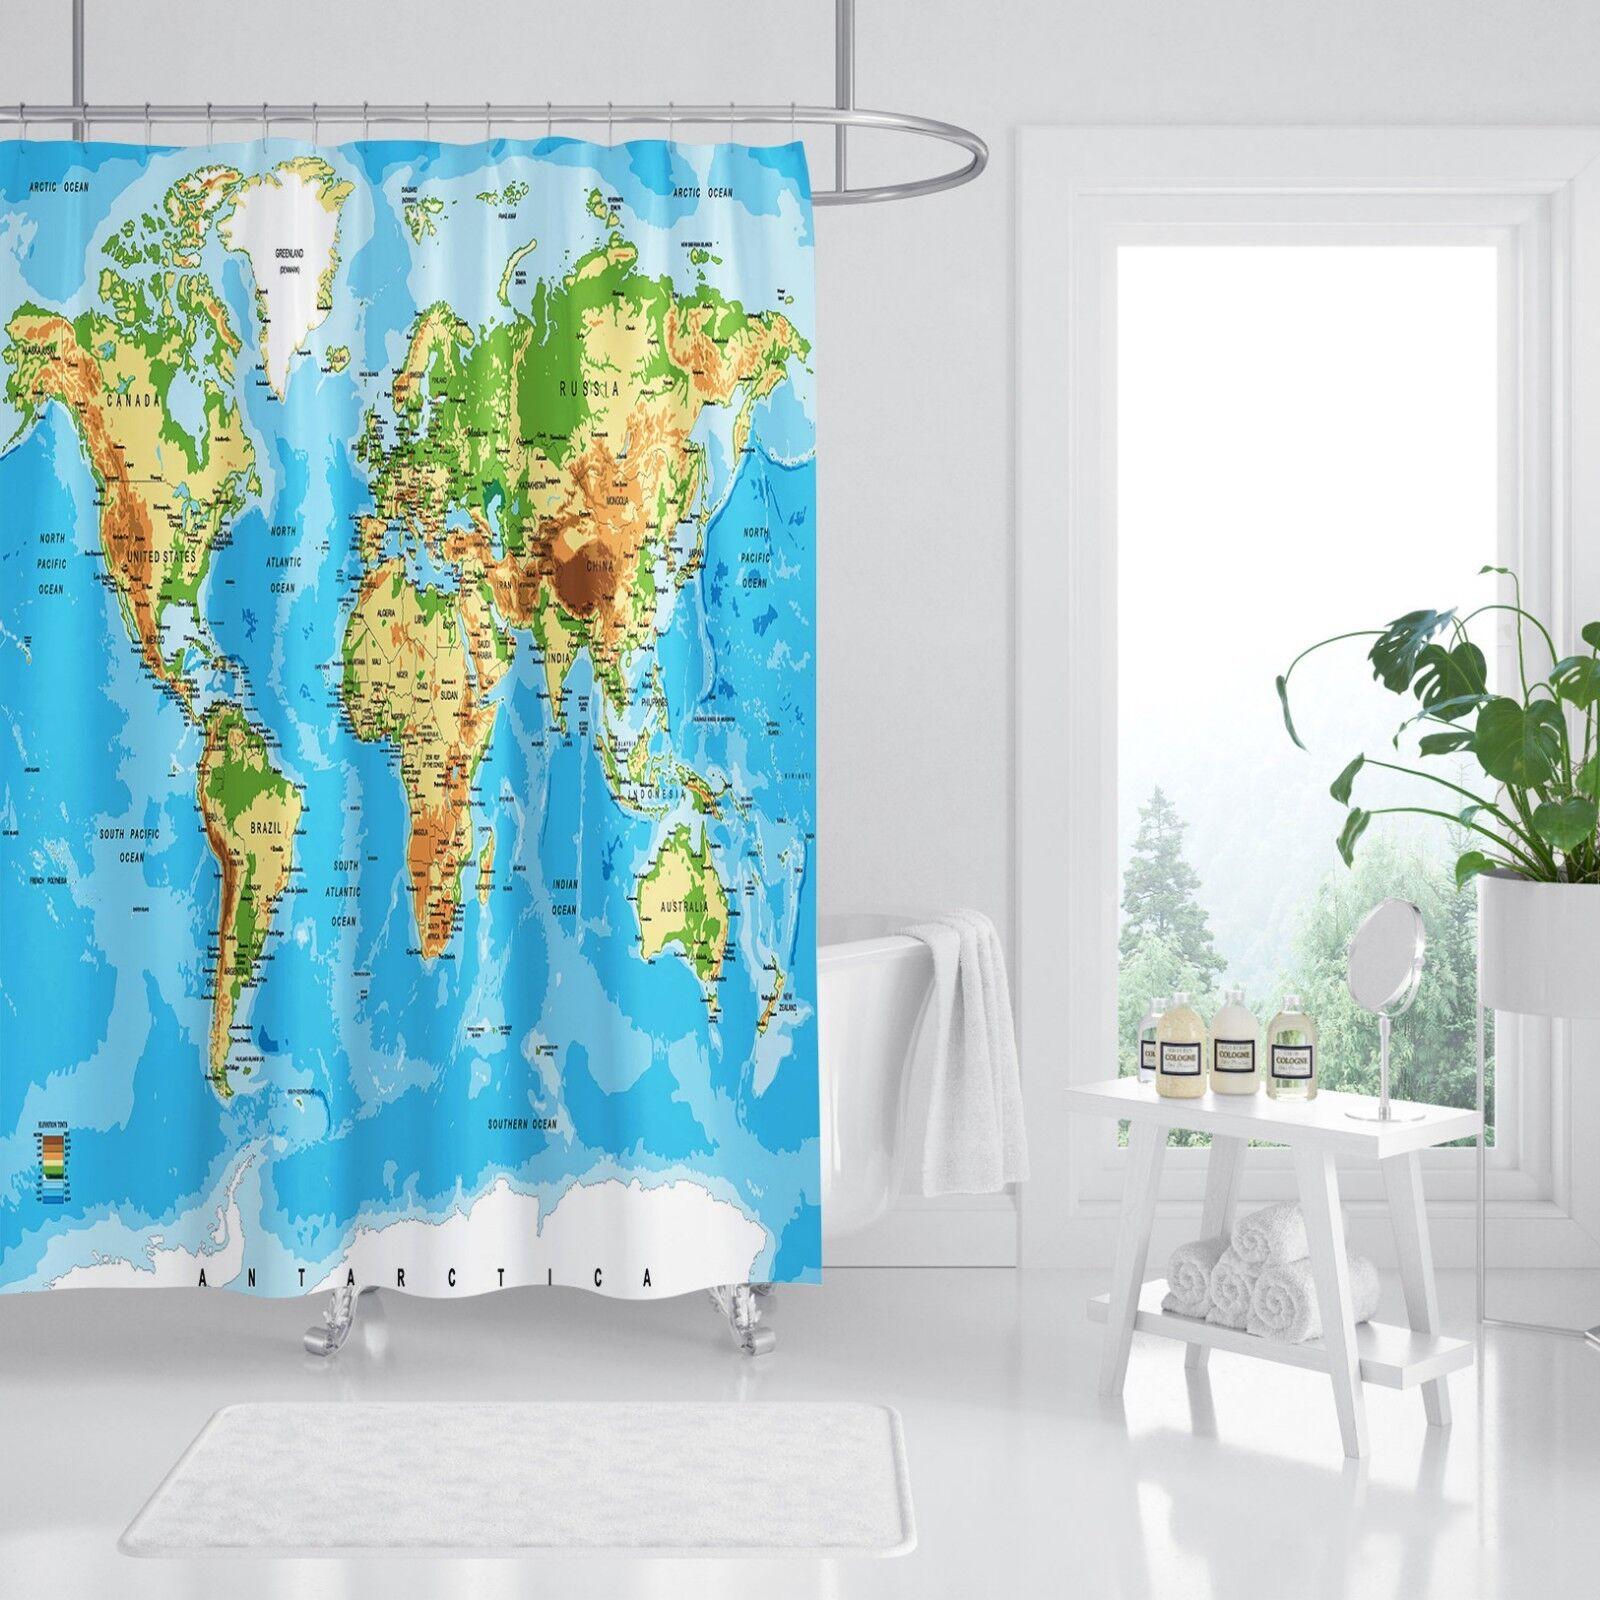 3D World Map Blau 54 Shower Curtain Waterproof Fiber Bathroom Windows Toilet